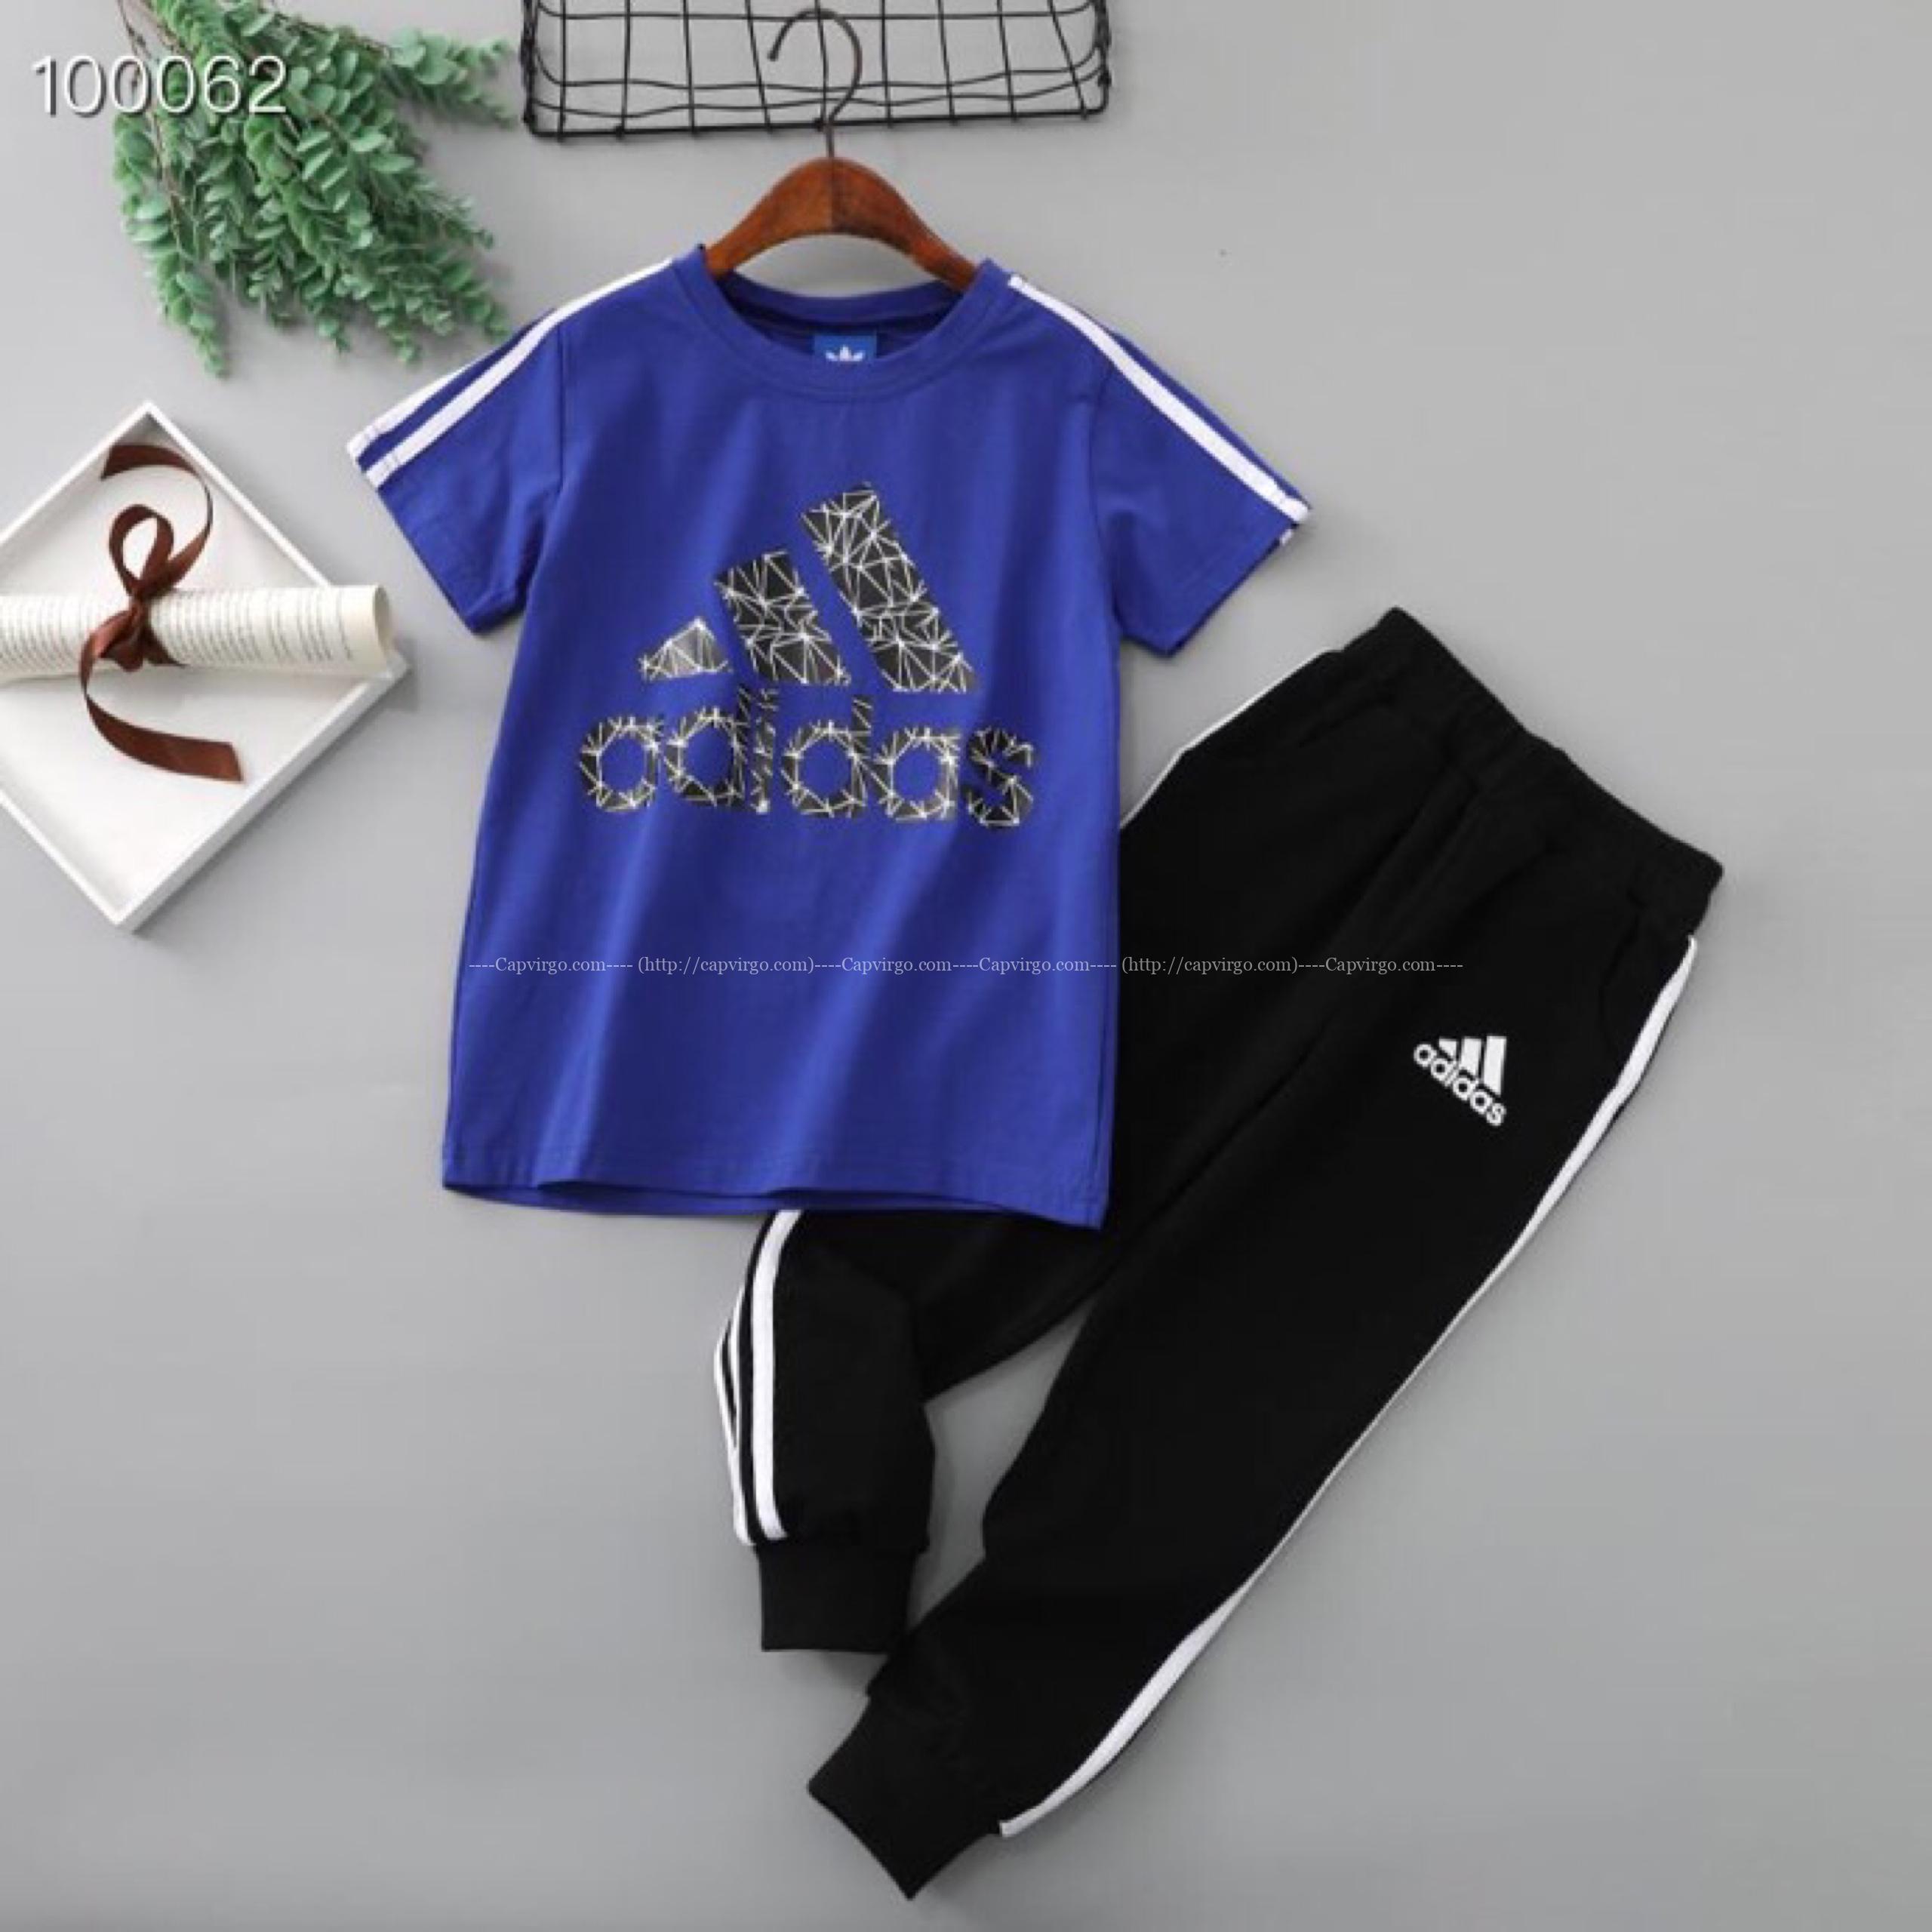 Bộ quần áo adidas trẻ em P850110170 logo họa tiết